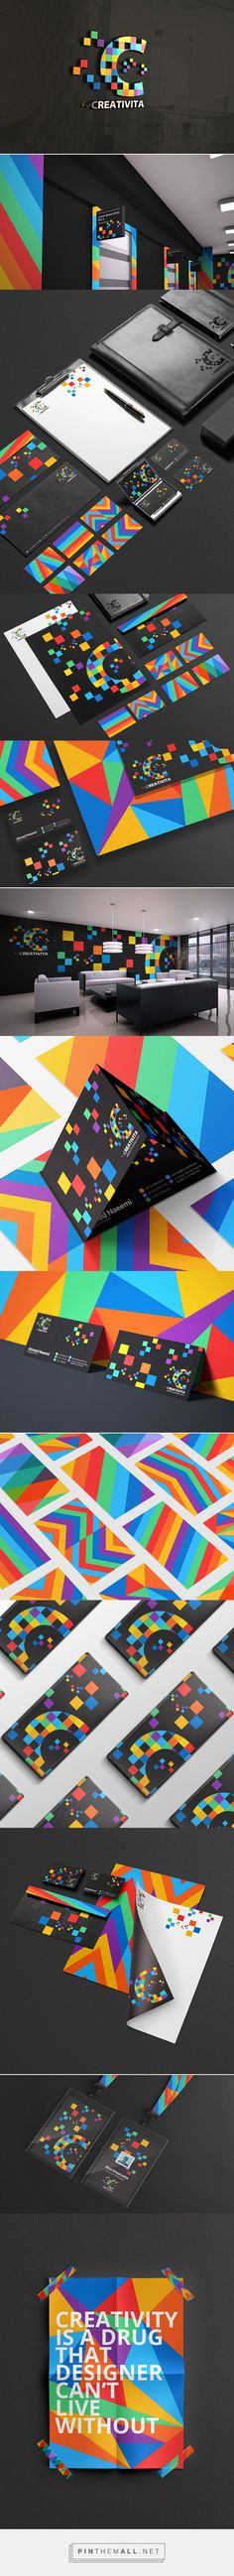 Creativita brand identity                                                                                                                                                                                 Más